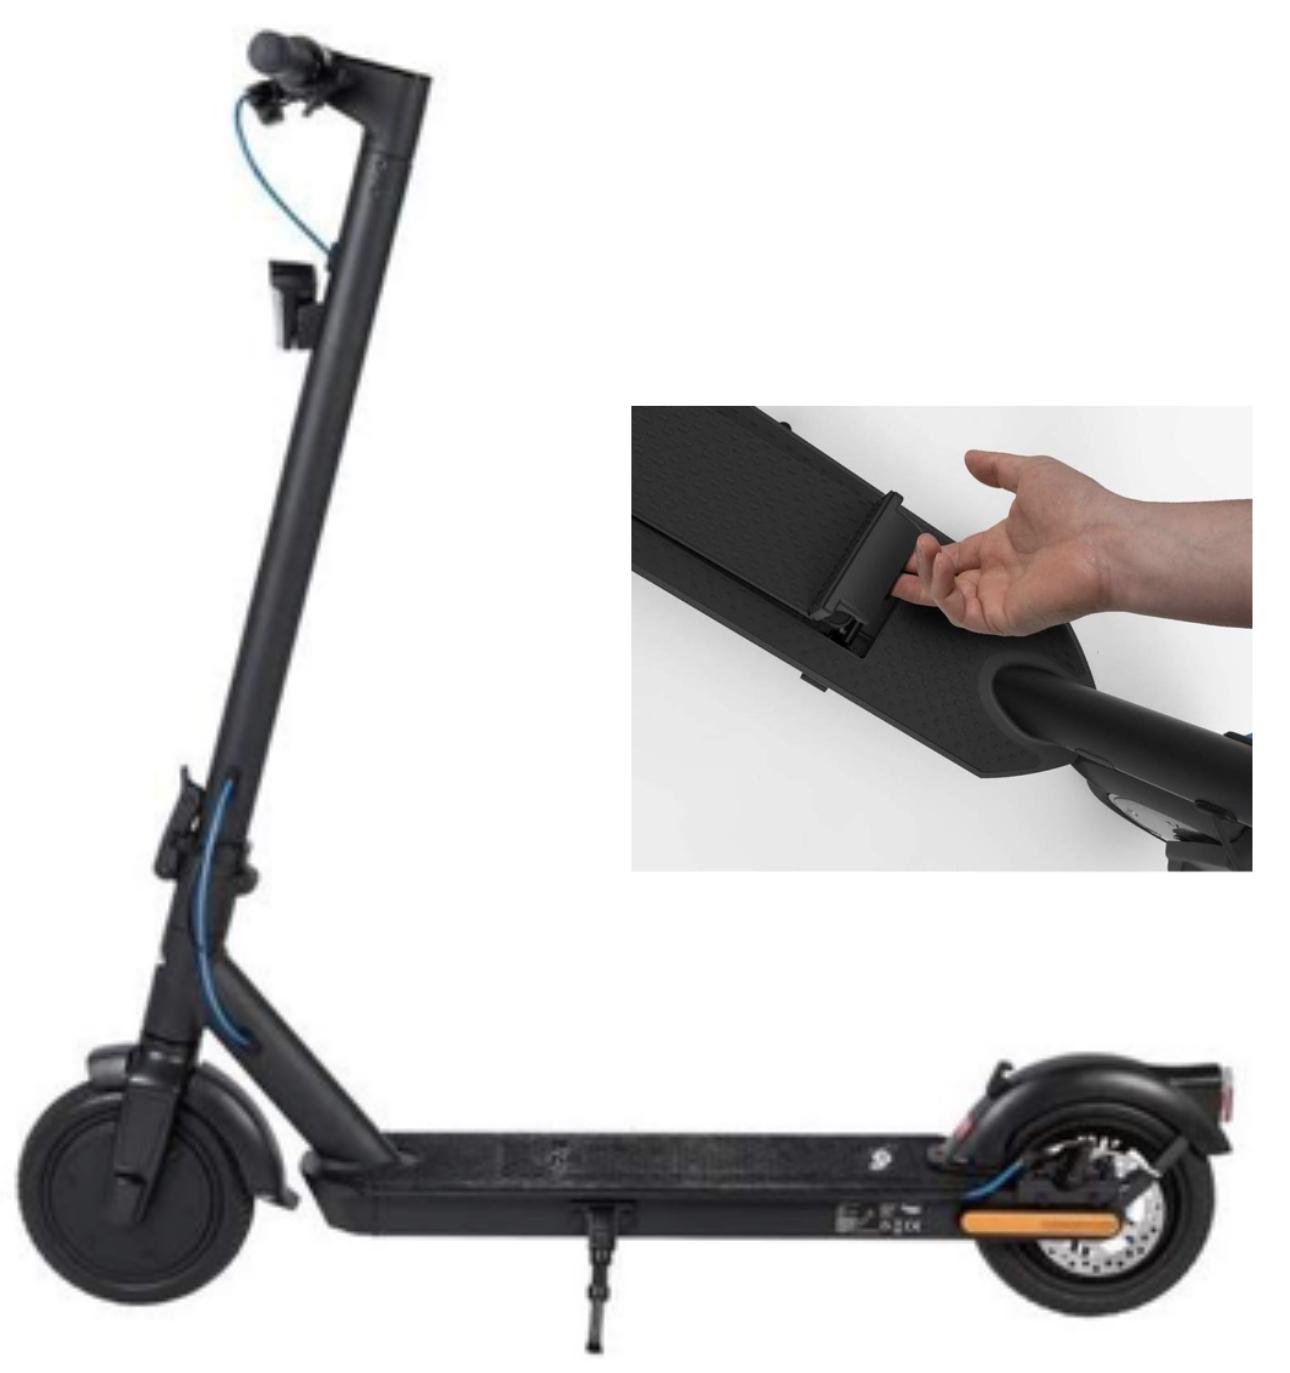 Lidl lokal: Doc Green EWA 6000 EKFV E-Scooter mit entnehmbarem Akku und Straßenzulassung für 299€